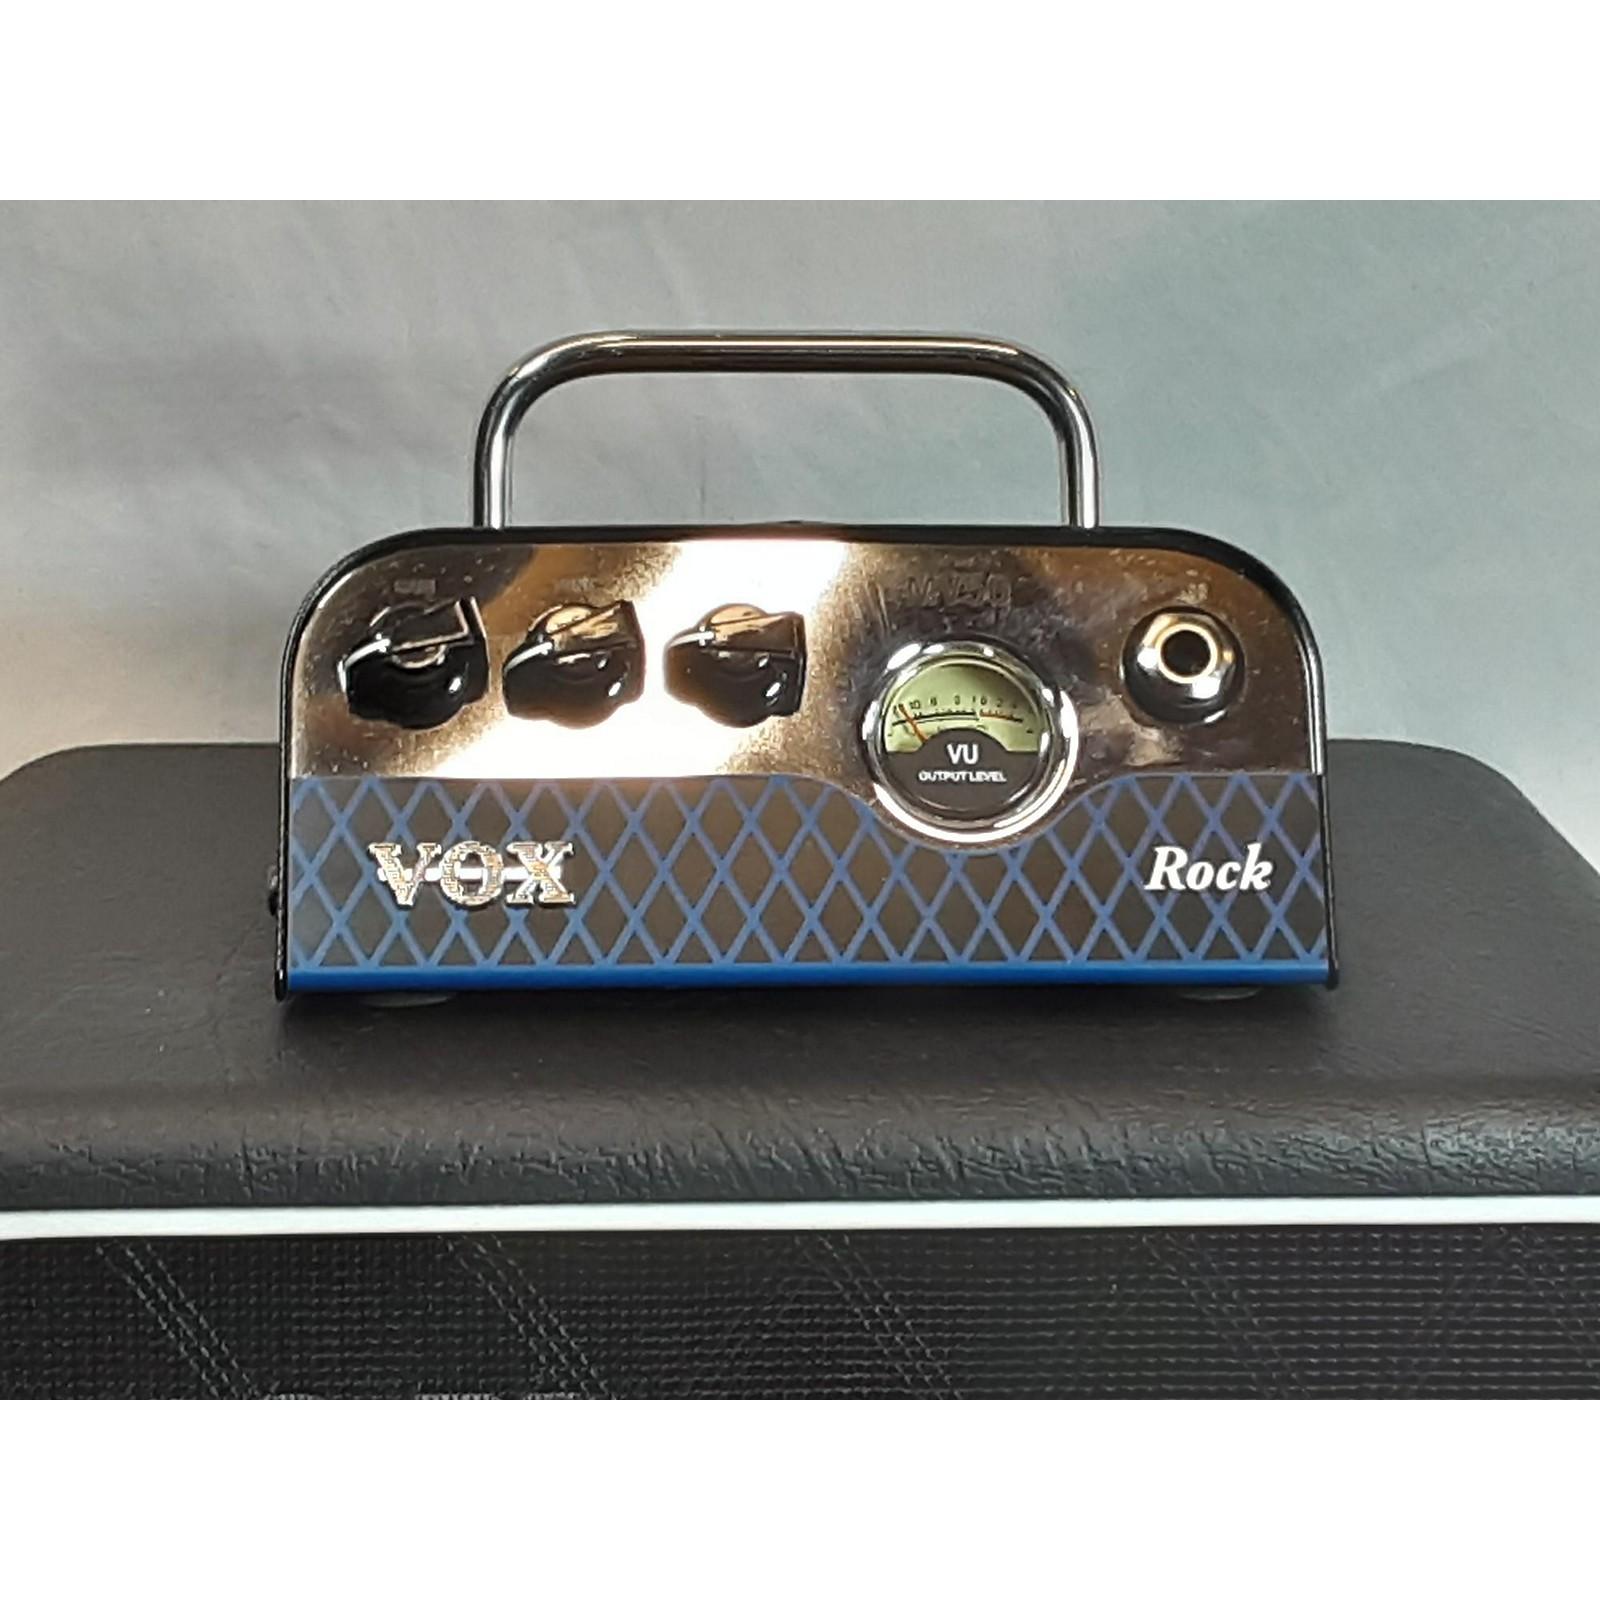 Vox MV50 Rock Guitar Amp Head